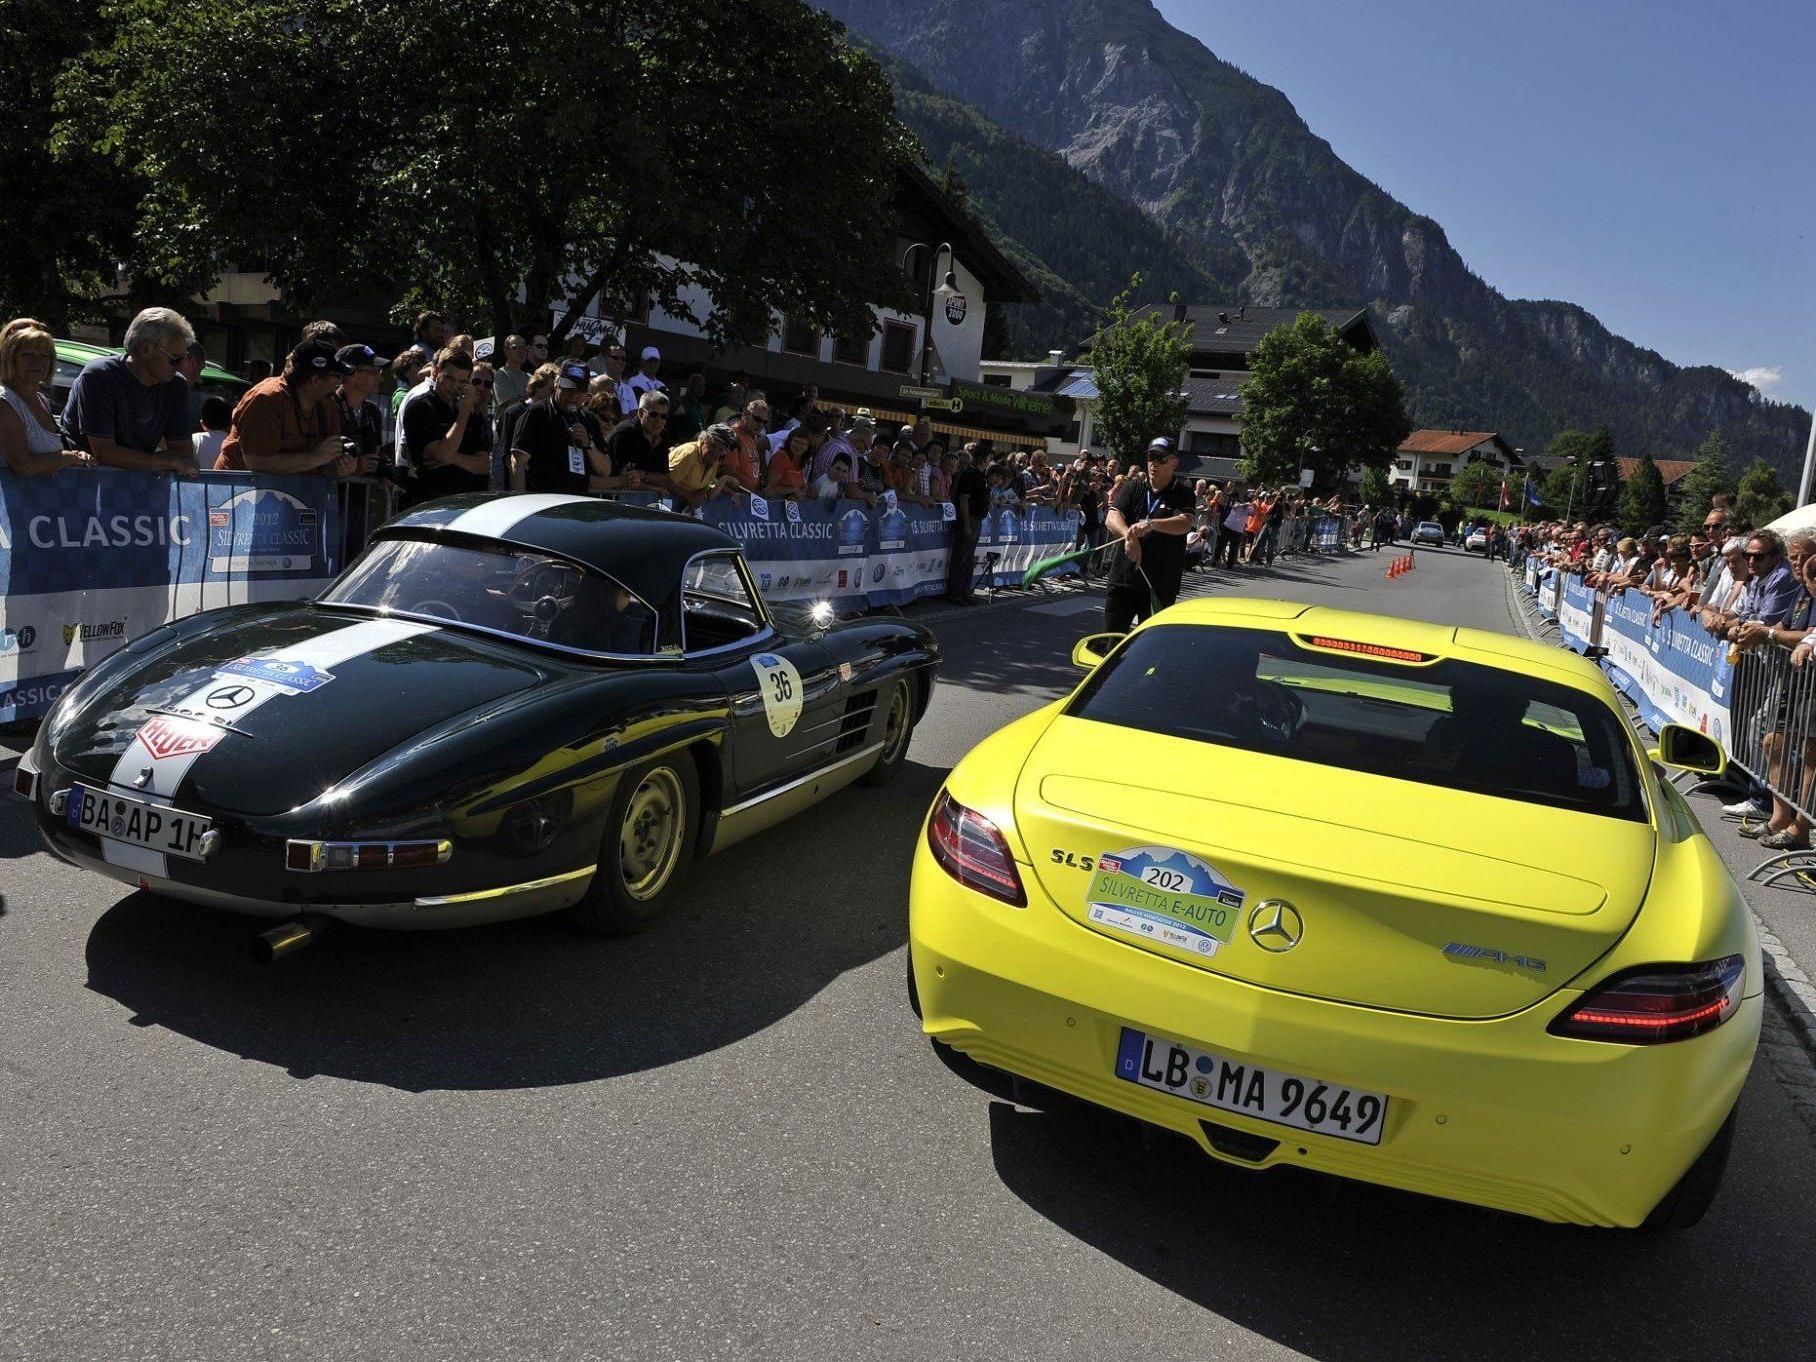 Am 4. Juli starten die 16. Silvretta Classic und 4. Silvretta E-Auto Rallye Montafon.